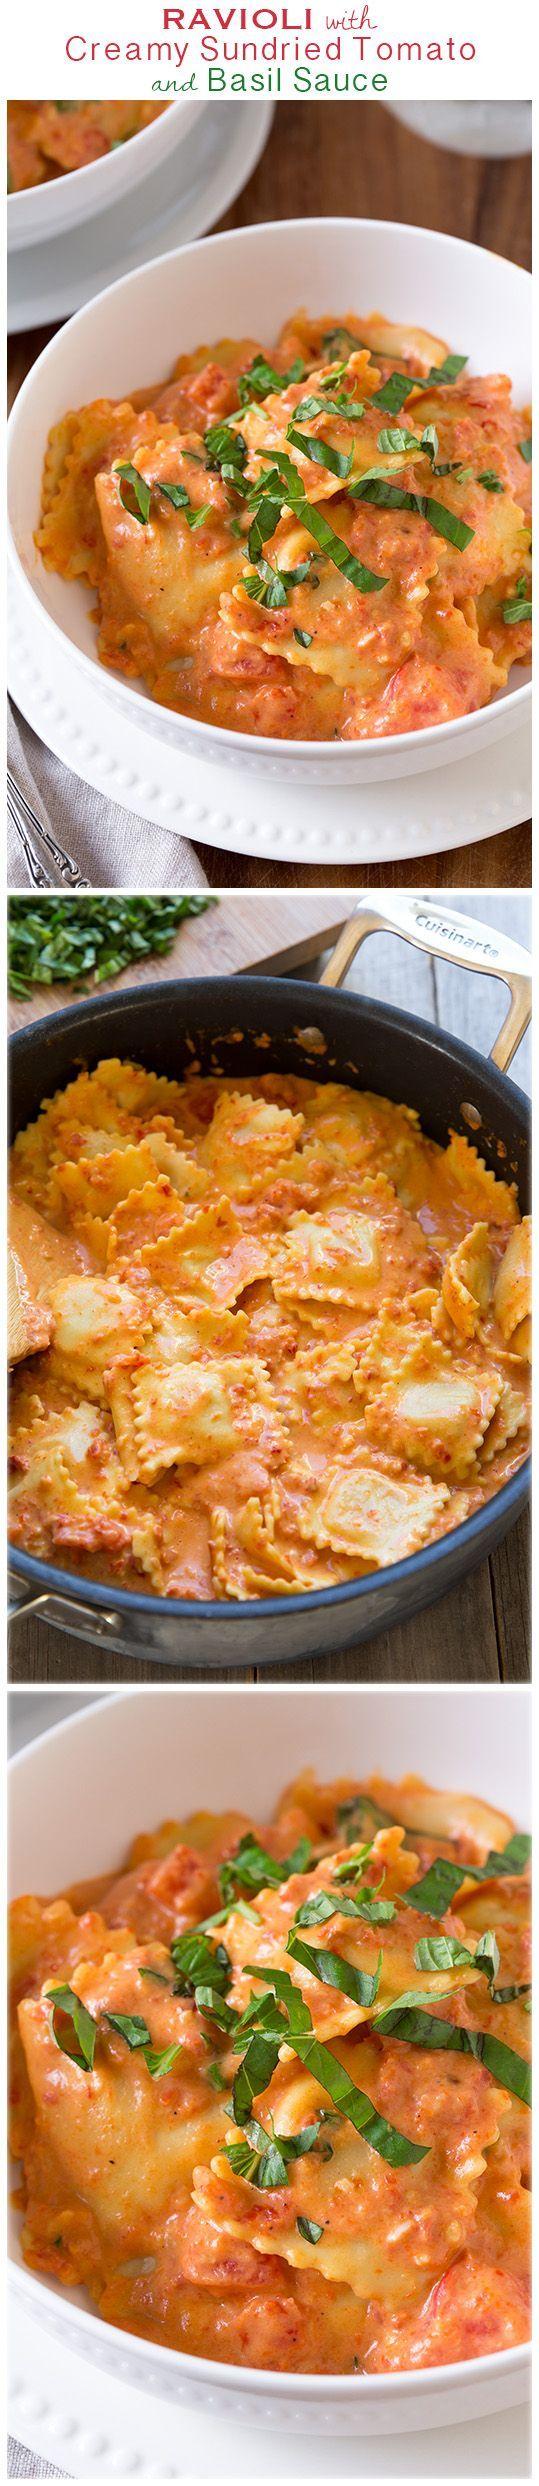 Ravioli with Creamy Sundried Tomato and Basil Sauce - this was ...